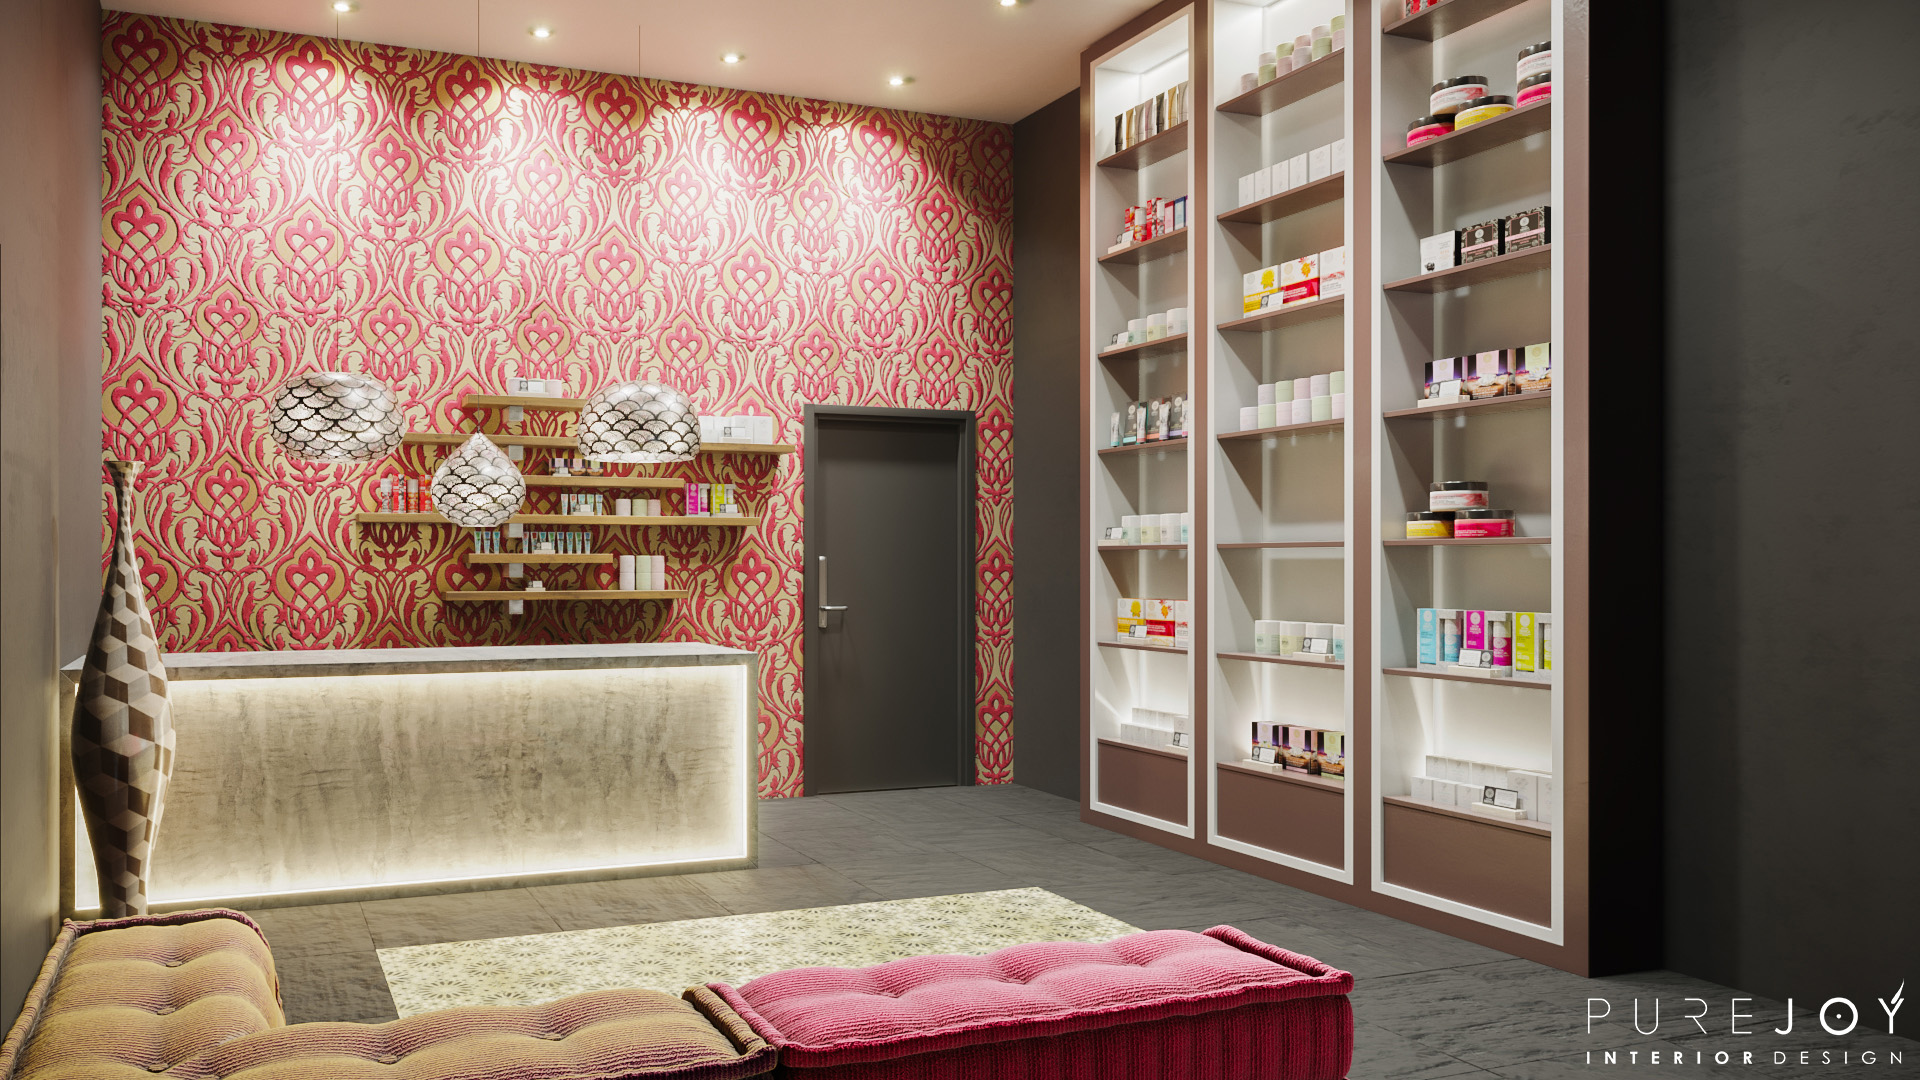 Creations - Oriental Spa Pure Joy Interior Design